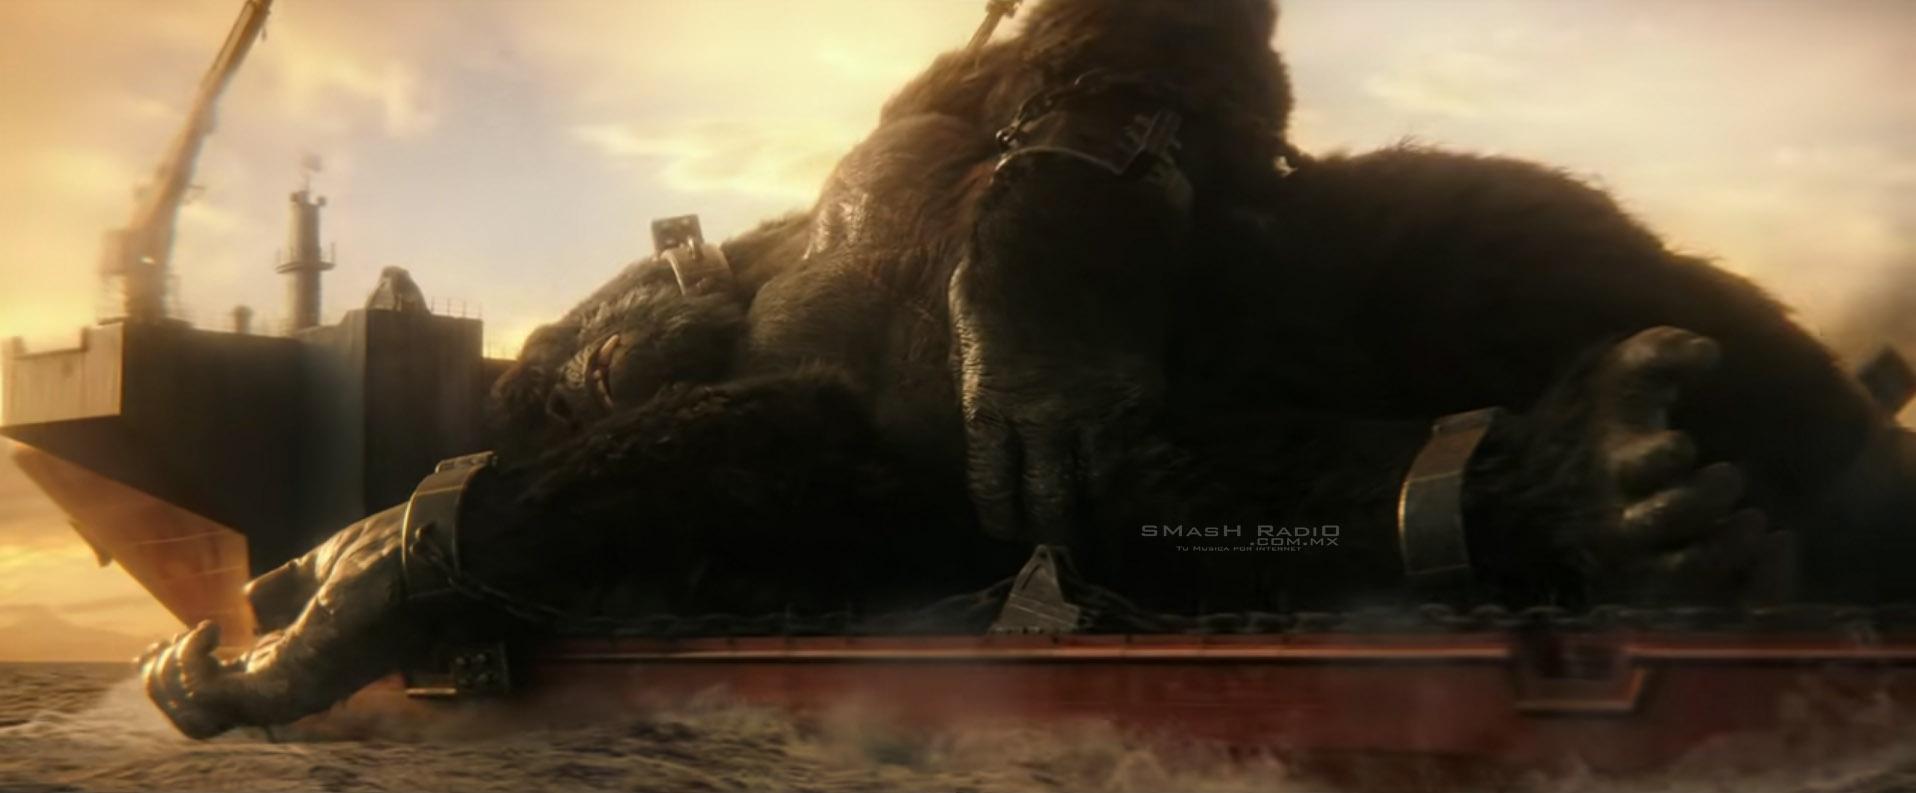 Godzilla vs Kong Trailer pic 1